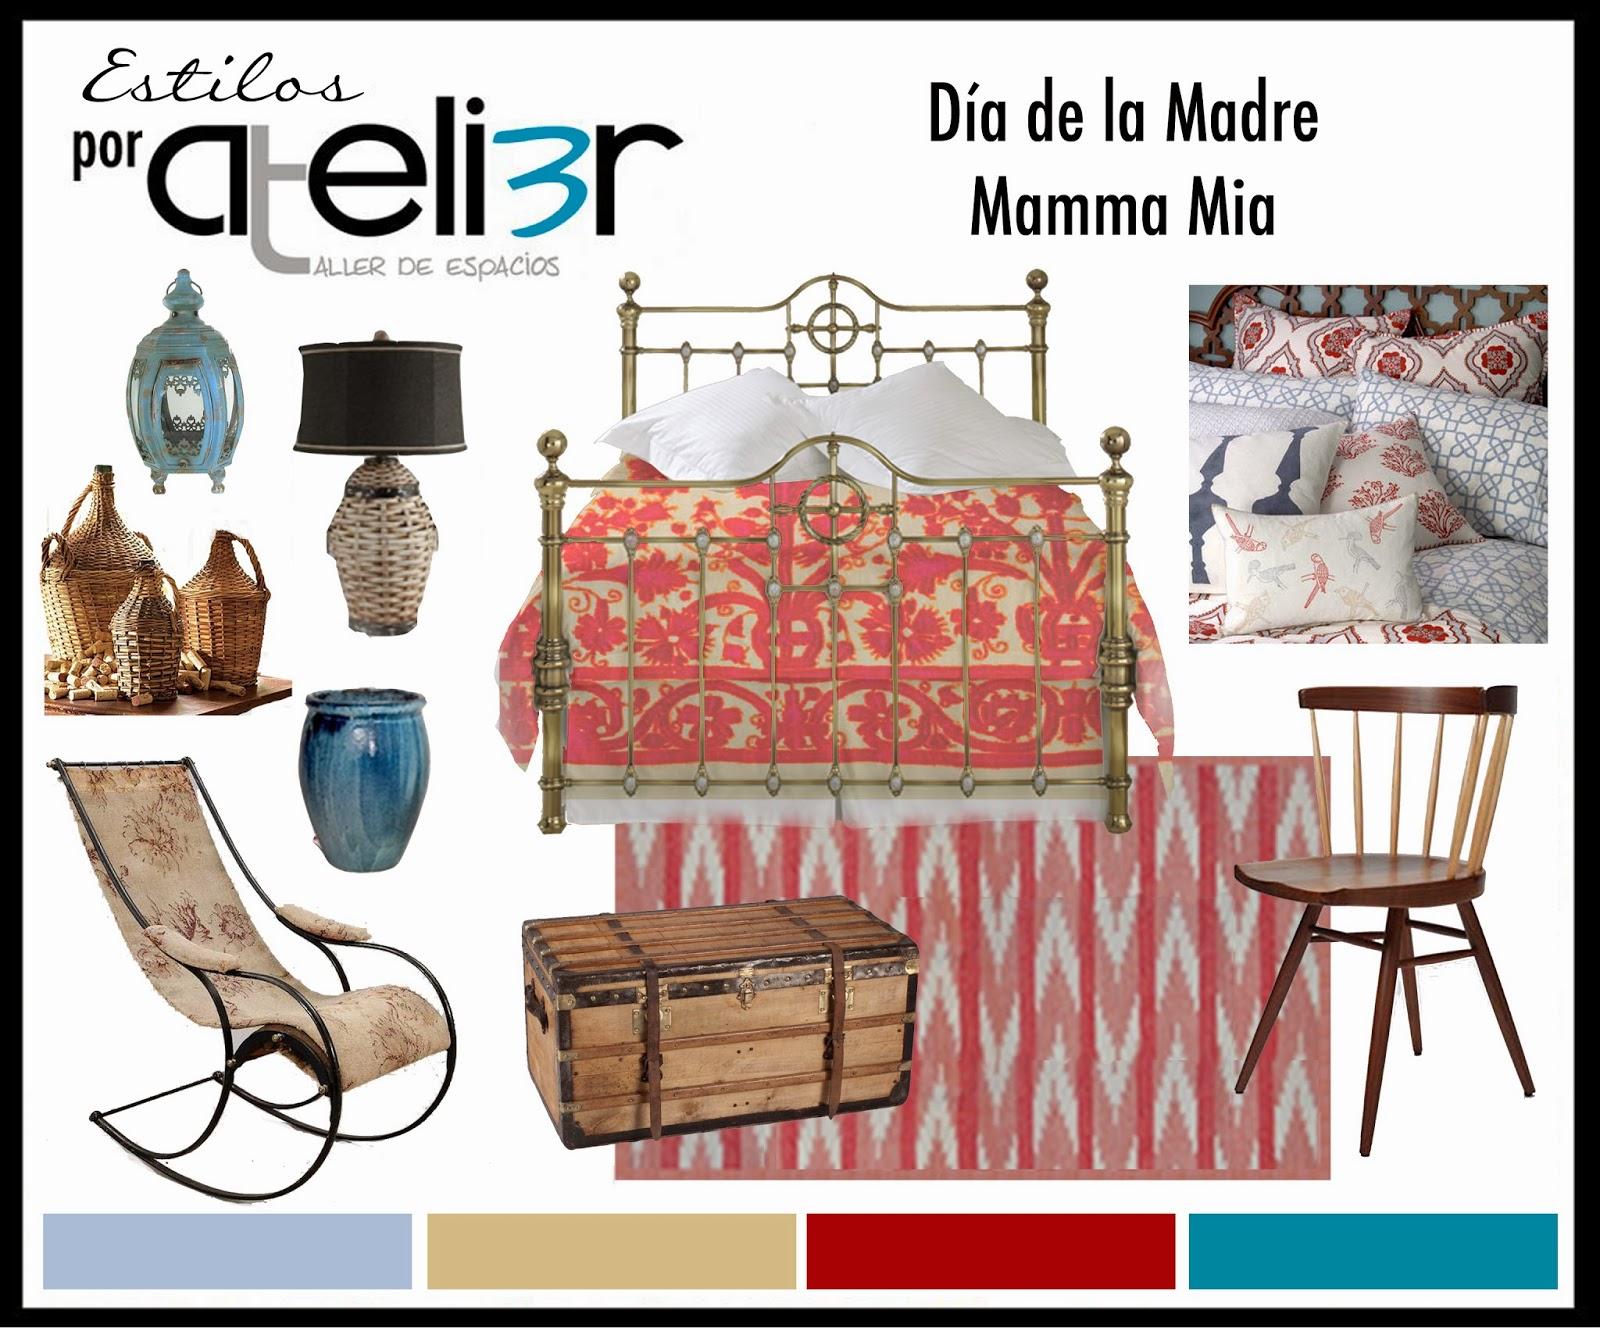 Mamma mia movie, estilo mediterráneo, diseño de interiores guatemala, guatemala interiores, dia de la madre, mothers day